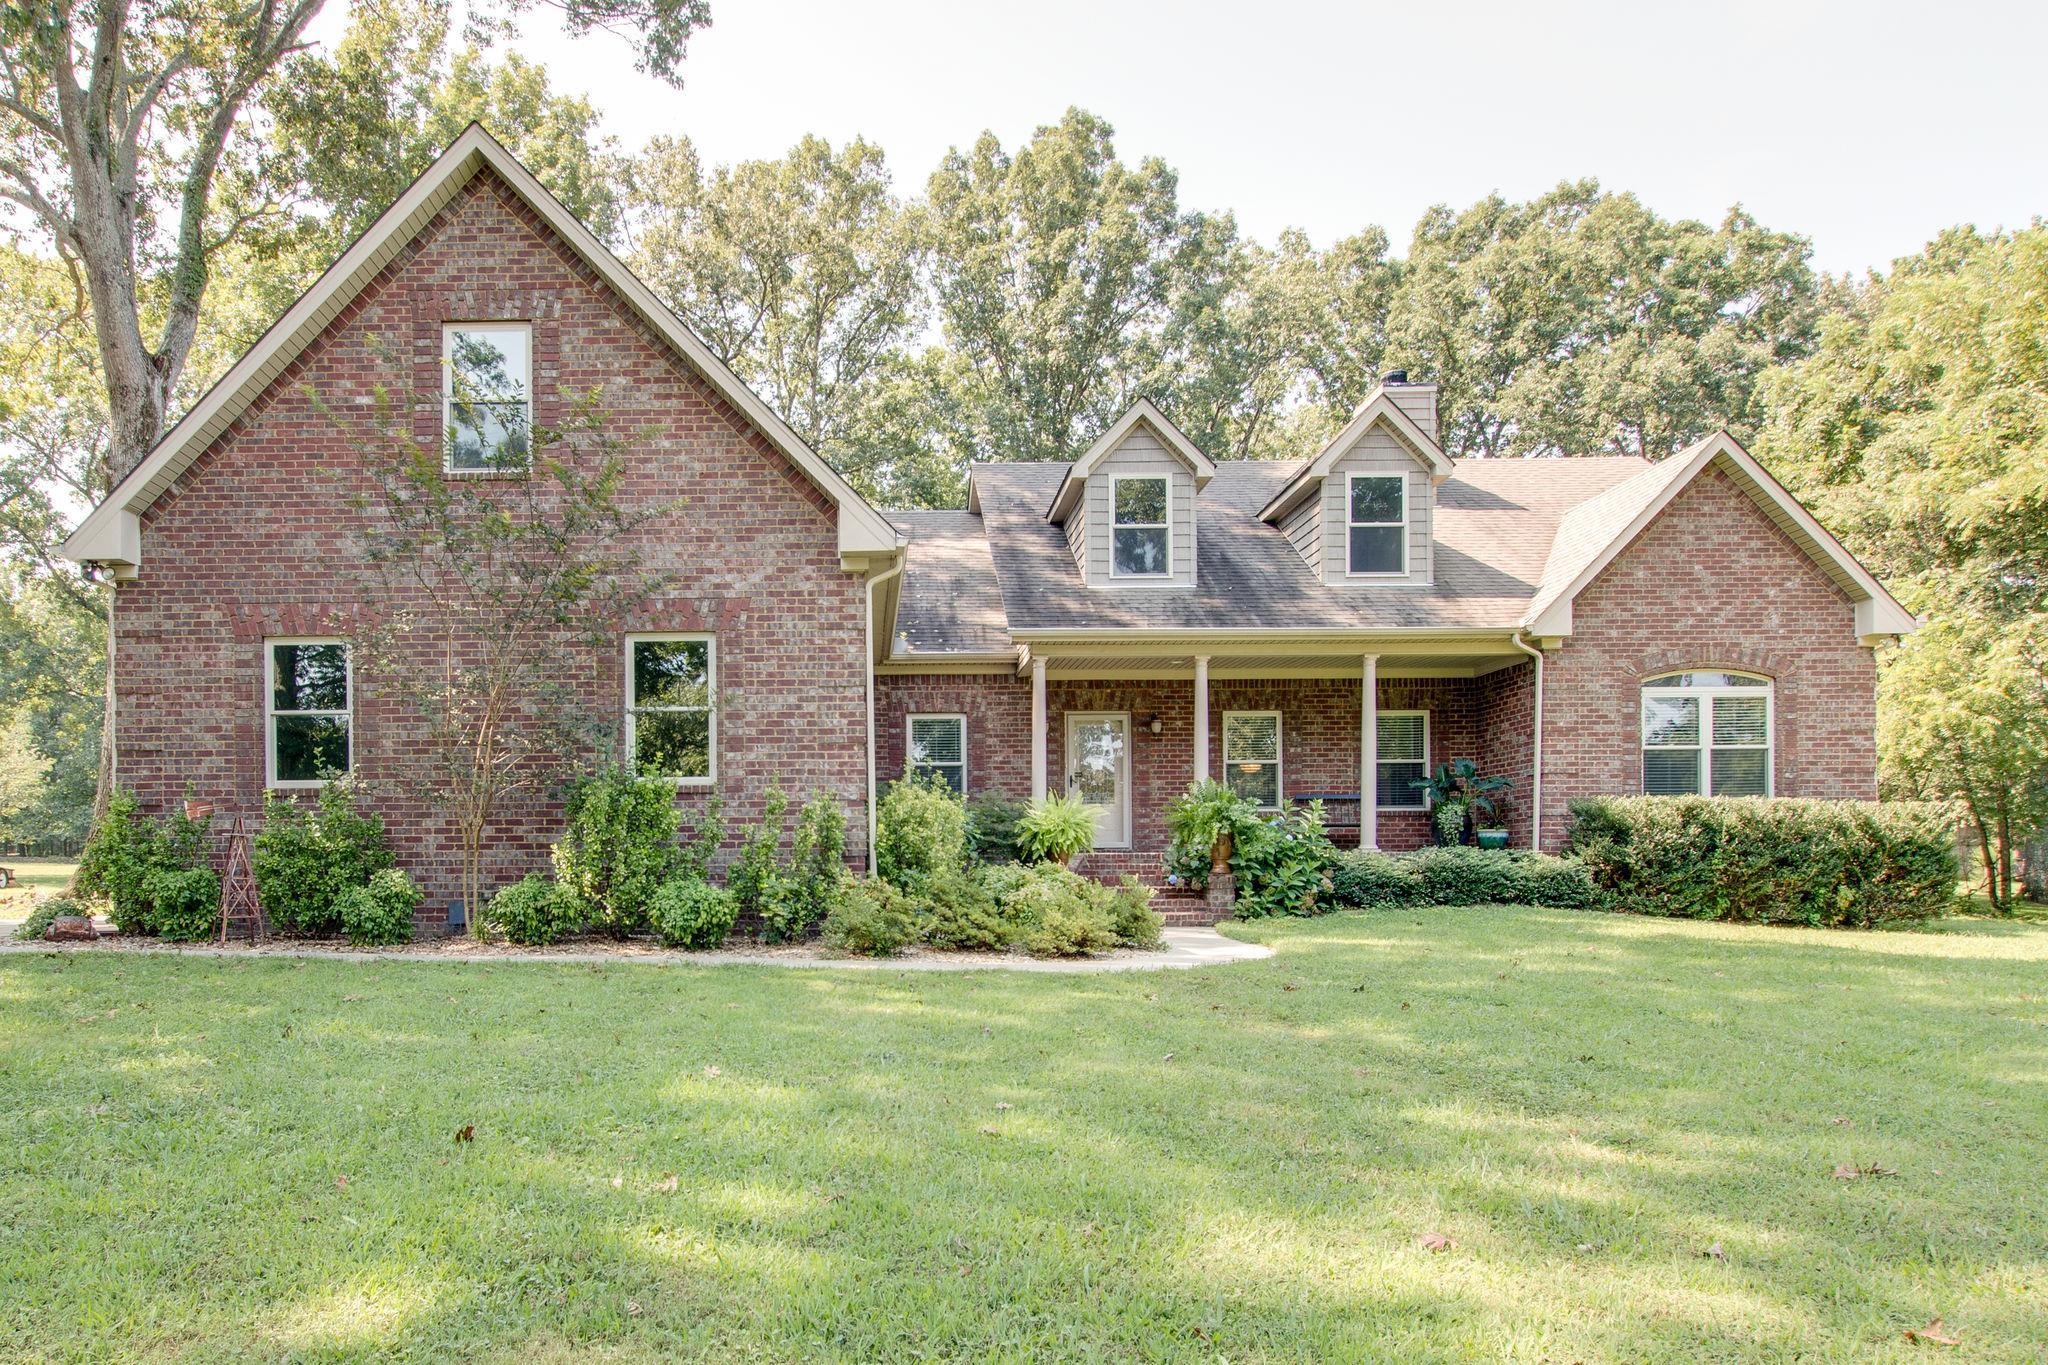 6629 Burnt Knob Rd, Murfreesboro, TN 37129 - Murfreesboro, TN real estate listing